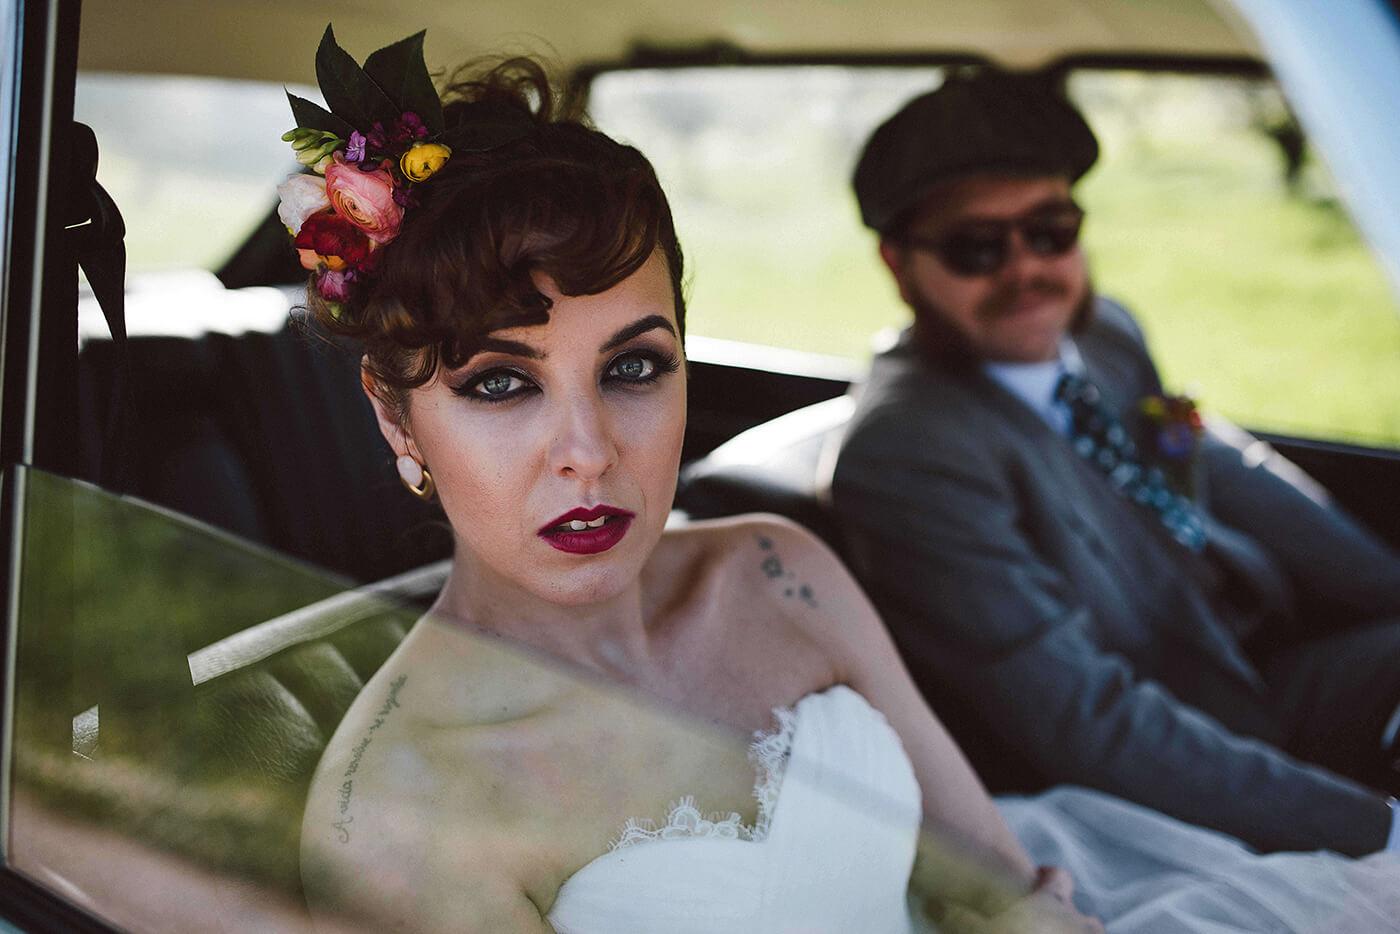 roma-organizacao-eventos-editorial-mid-century-modern-wedding-in-a-strawberry-field-33